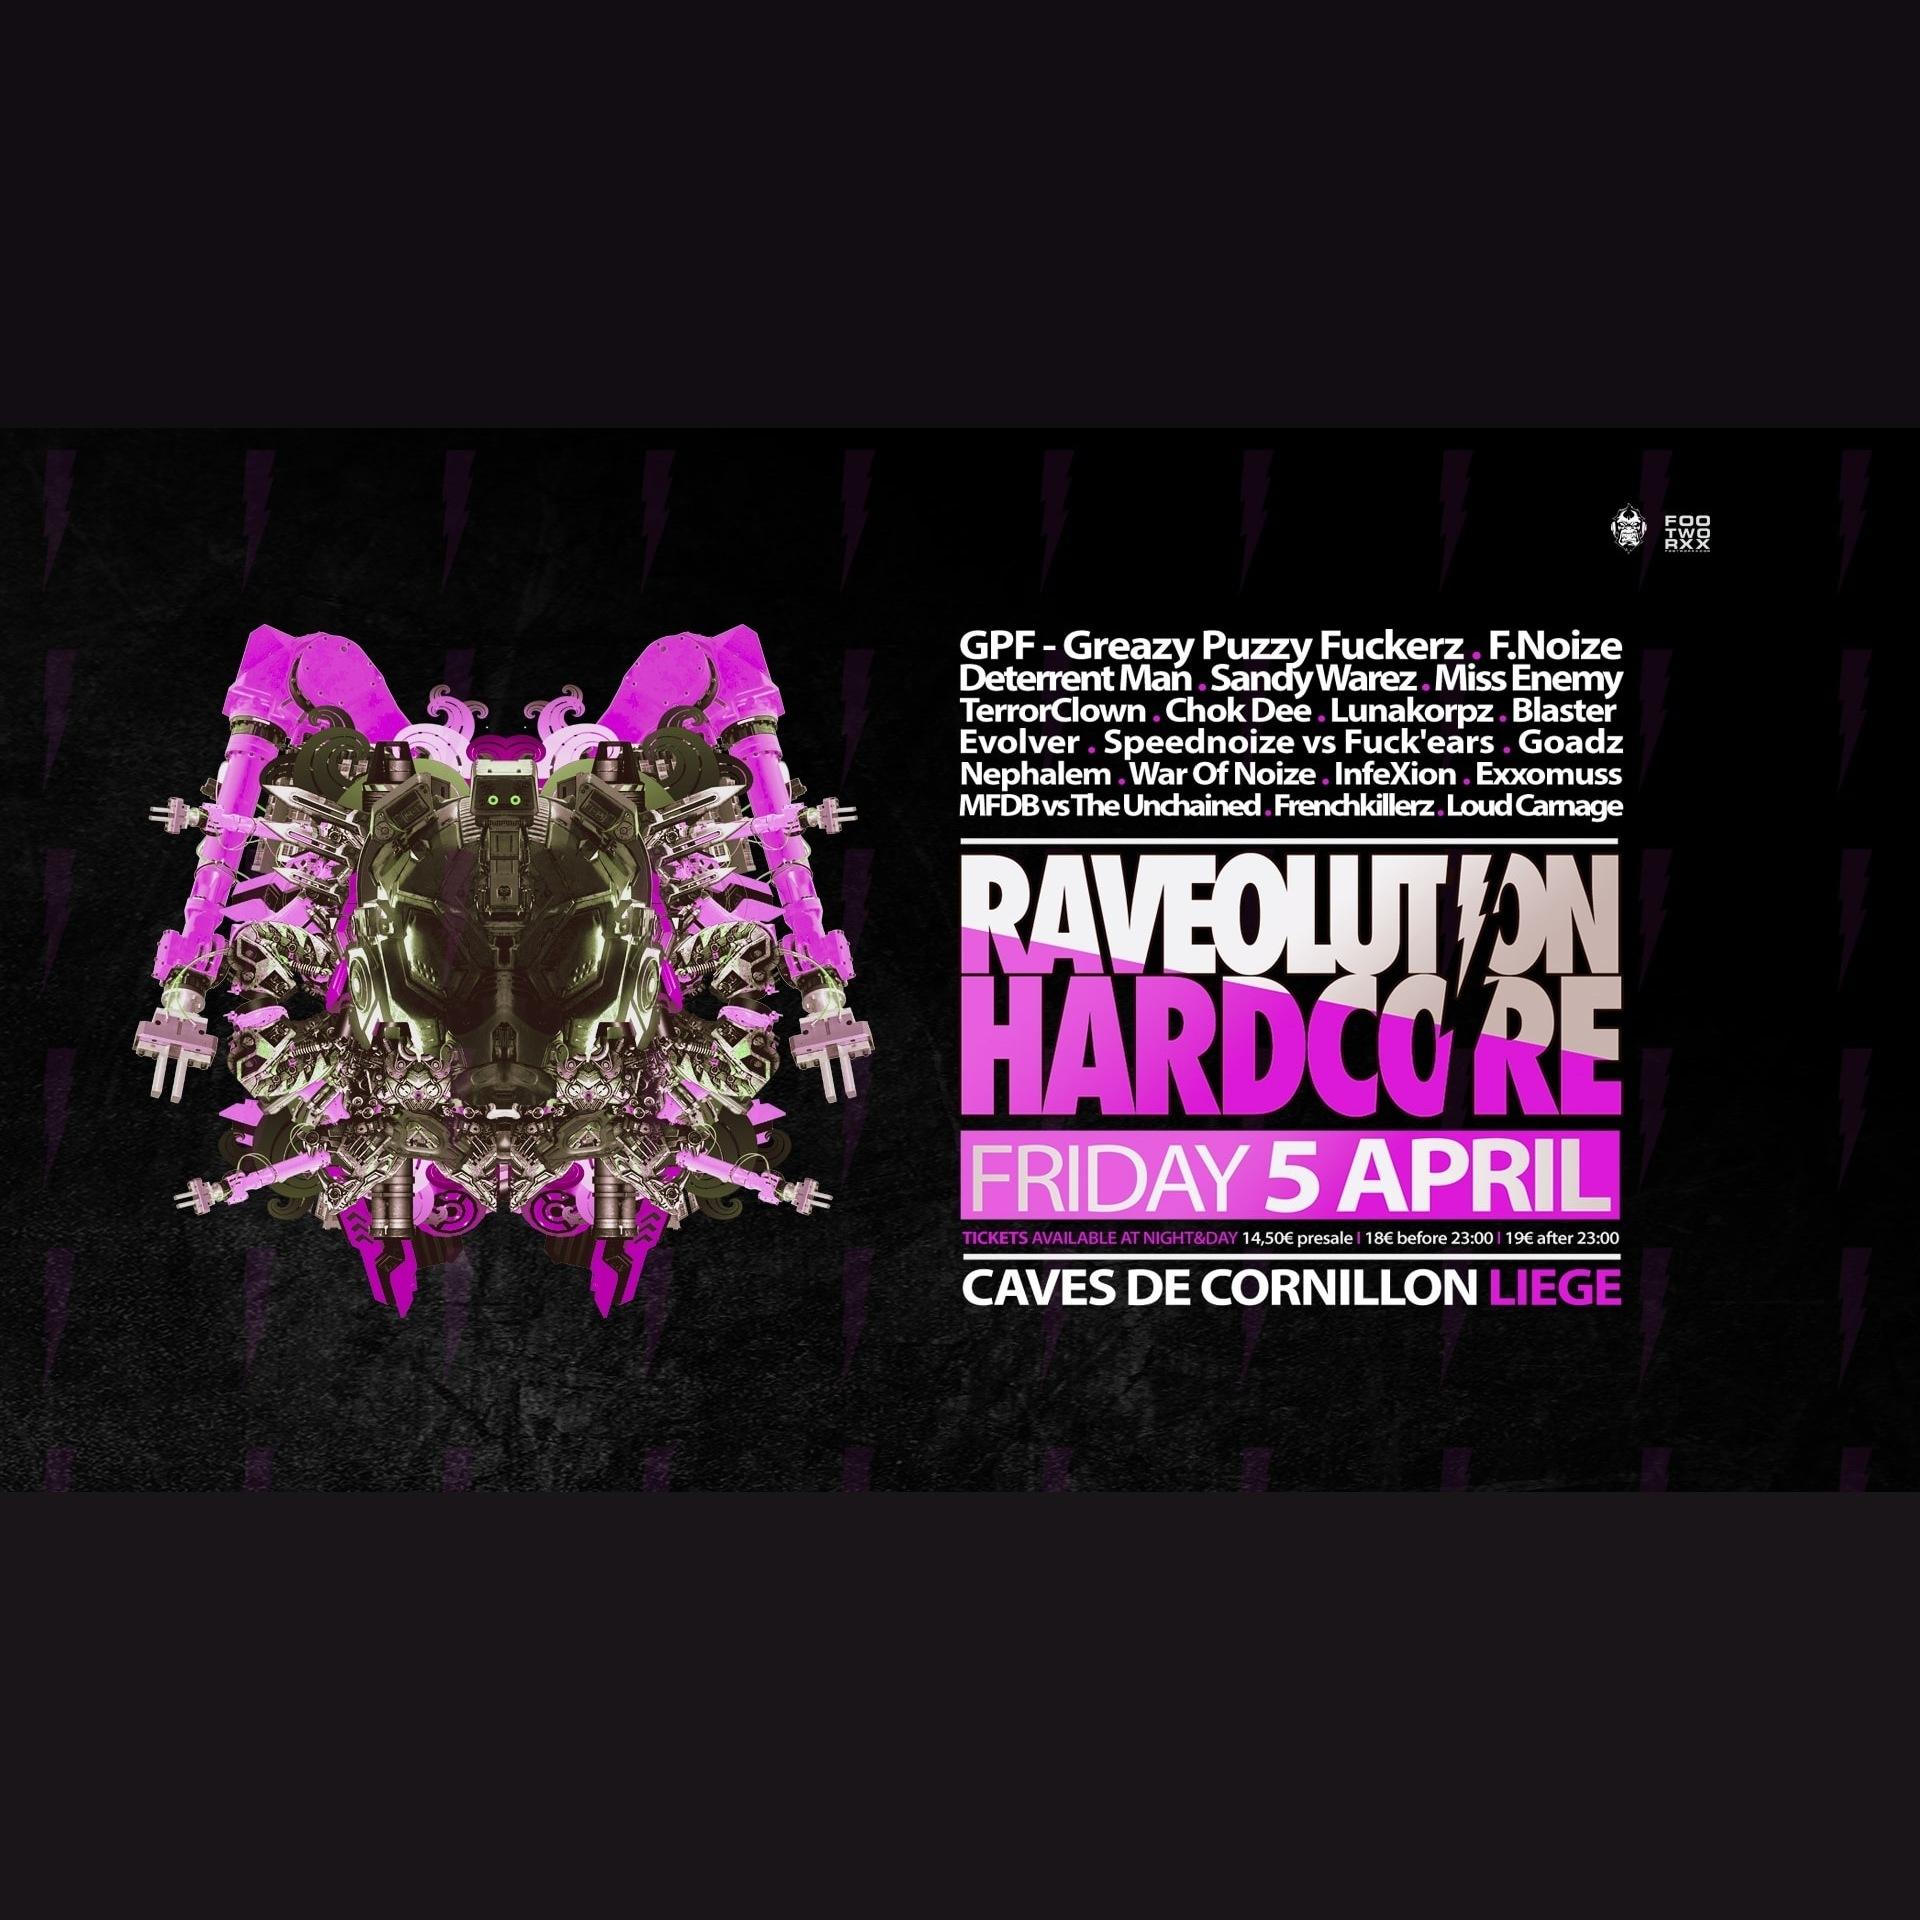 Raveolution Hardcore 2019 - Tickets, line-up & info